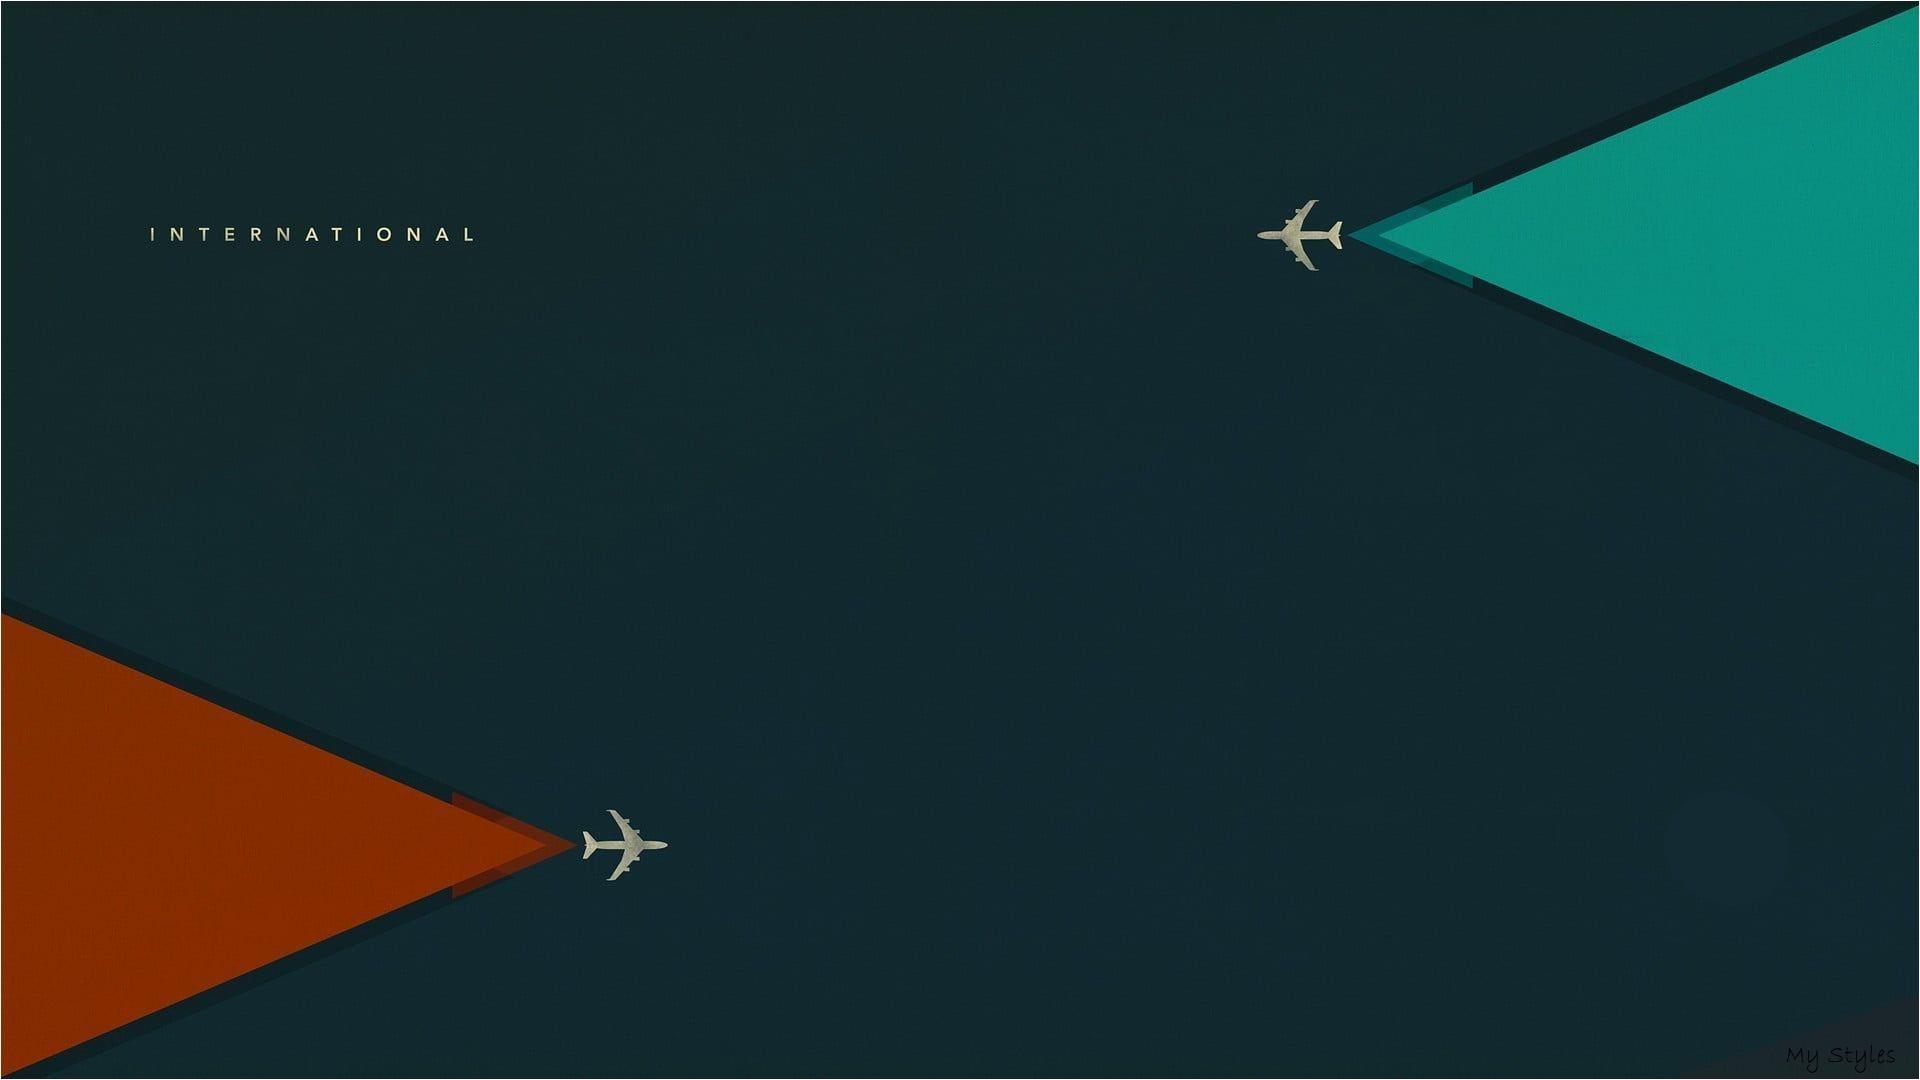 International plane illustration #vector #airplane #minimalism digital art #artwork #aircr- #aircraft #art #drawing